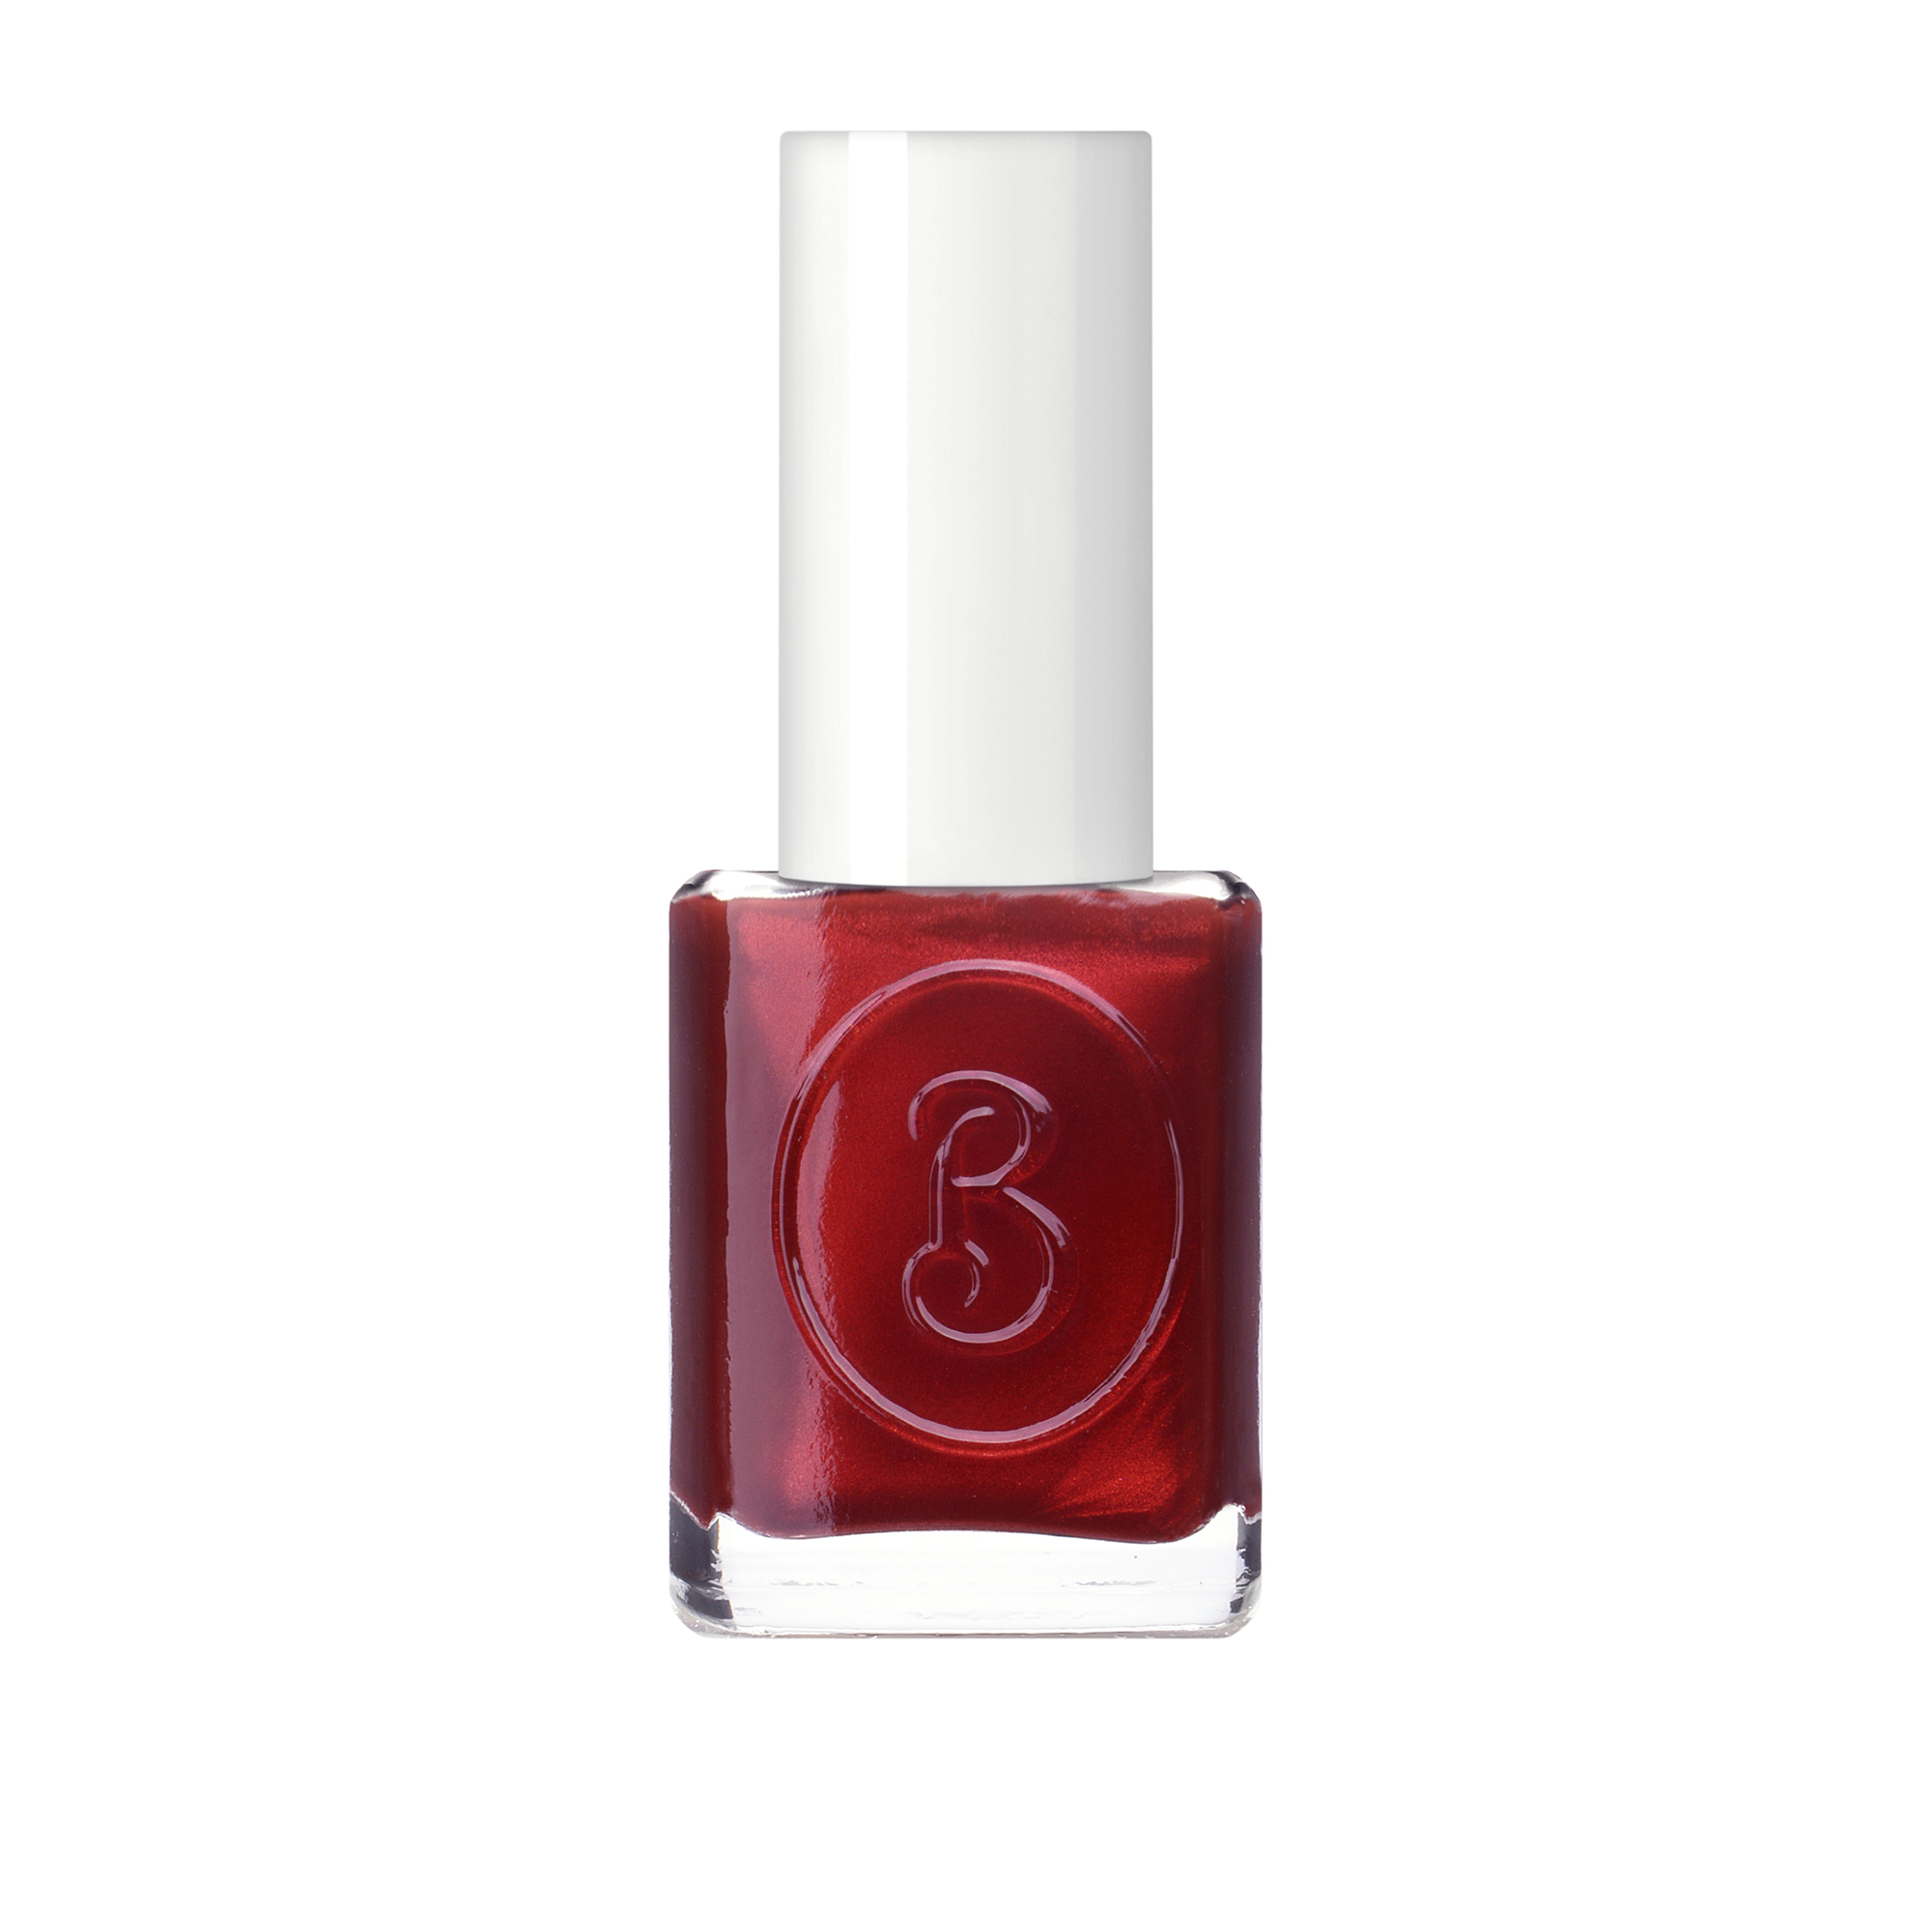 BERENICE Лак для ногтей красный пожар тон 28 red fire / BERENICE 16 мл